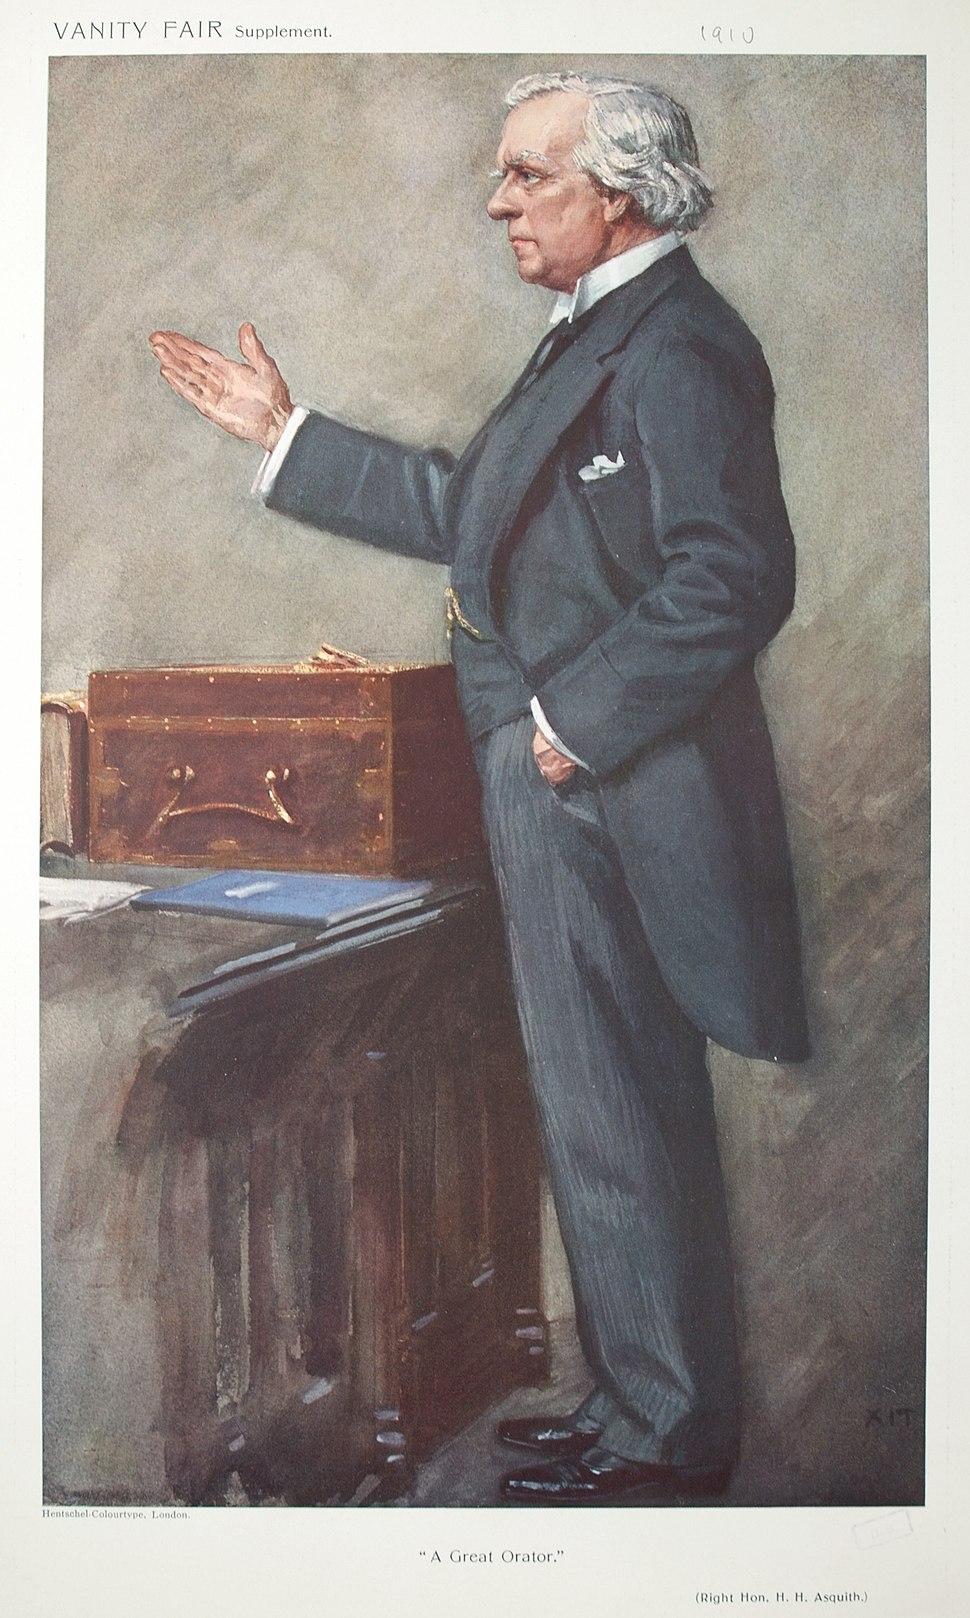 Herbert Henry Asquith Vanity Fair 17 March 1910